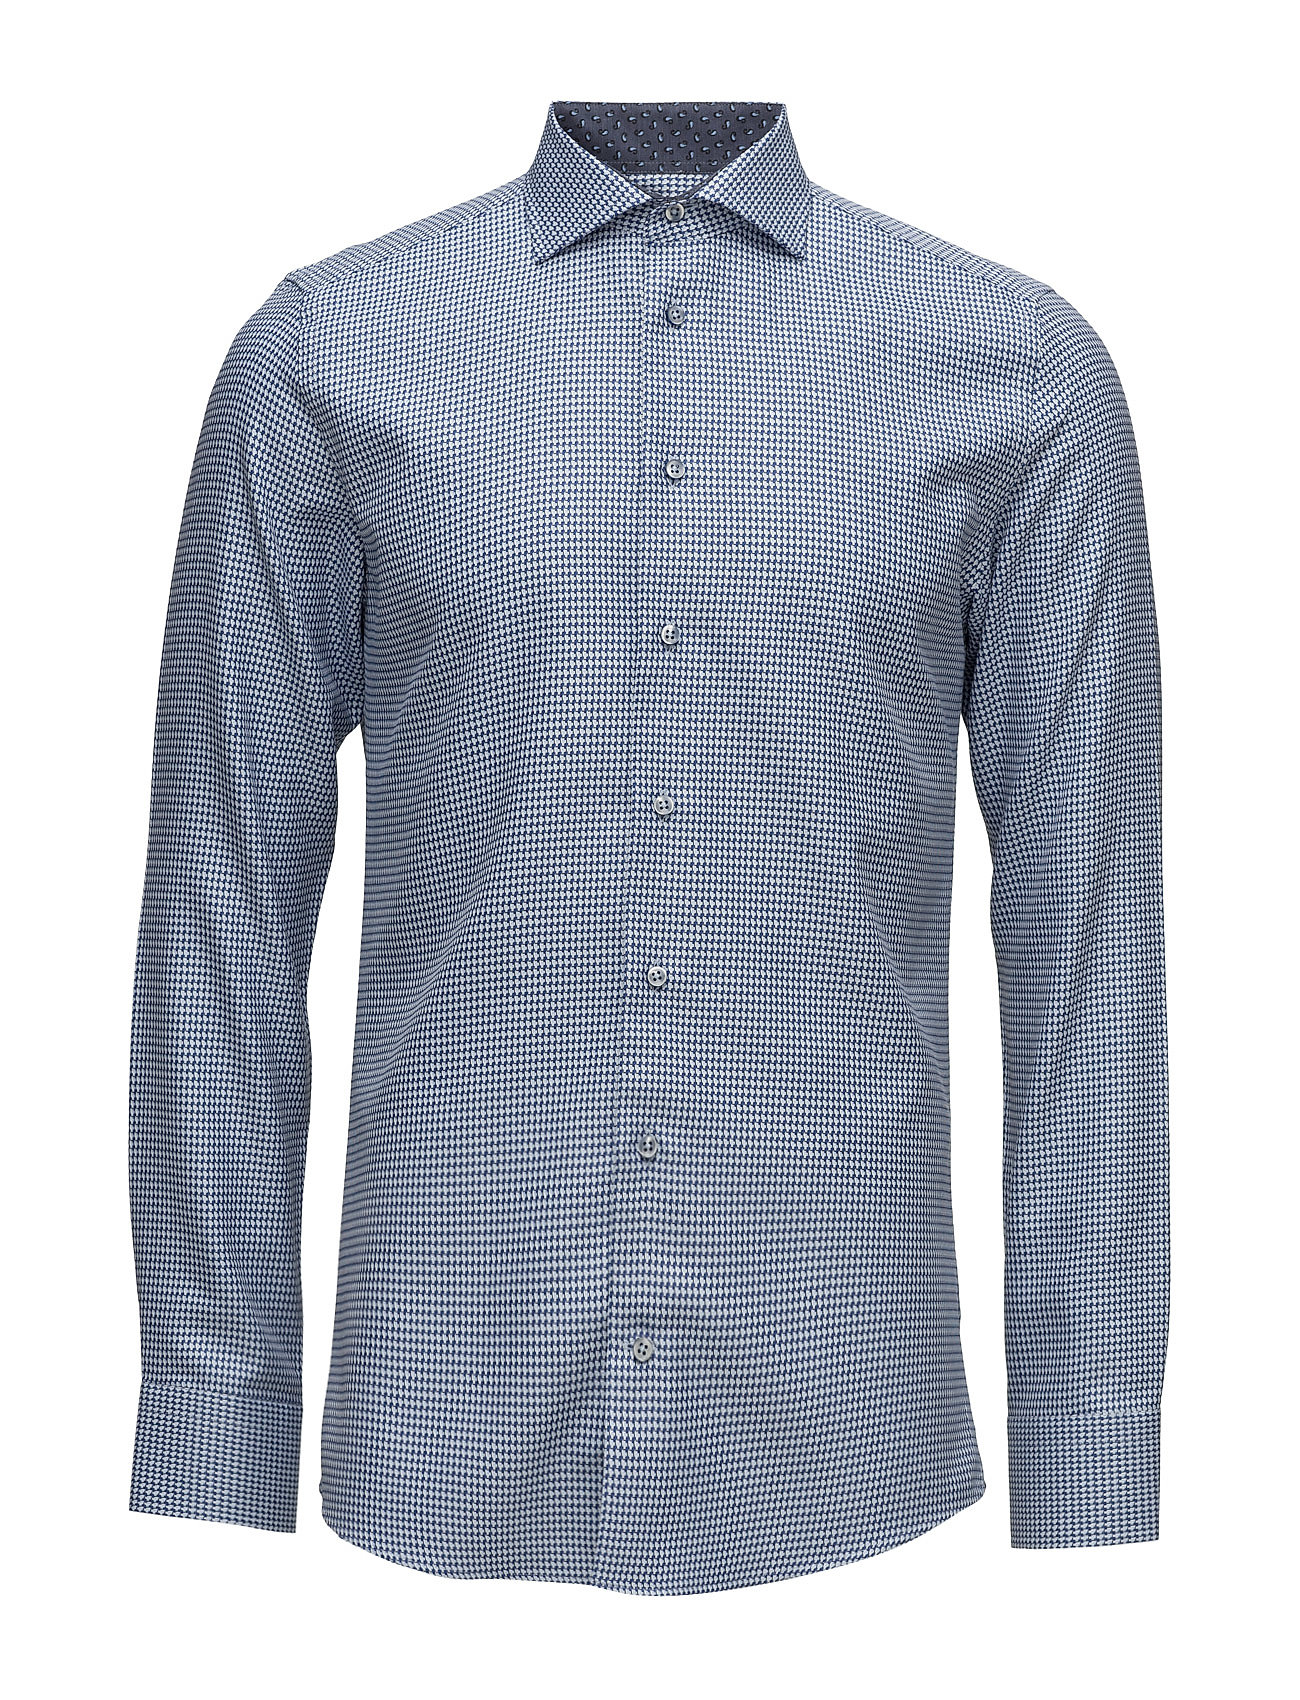 xo shirtmaker – 8839 details - jake fc på boozt.com dk